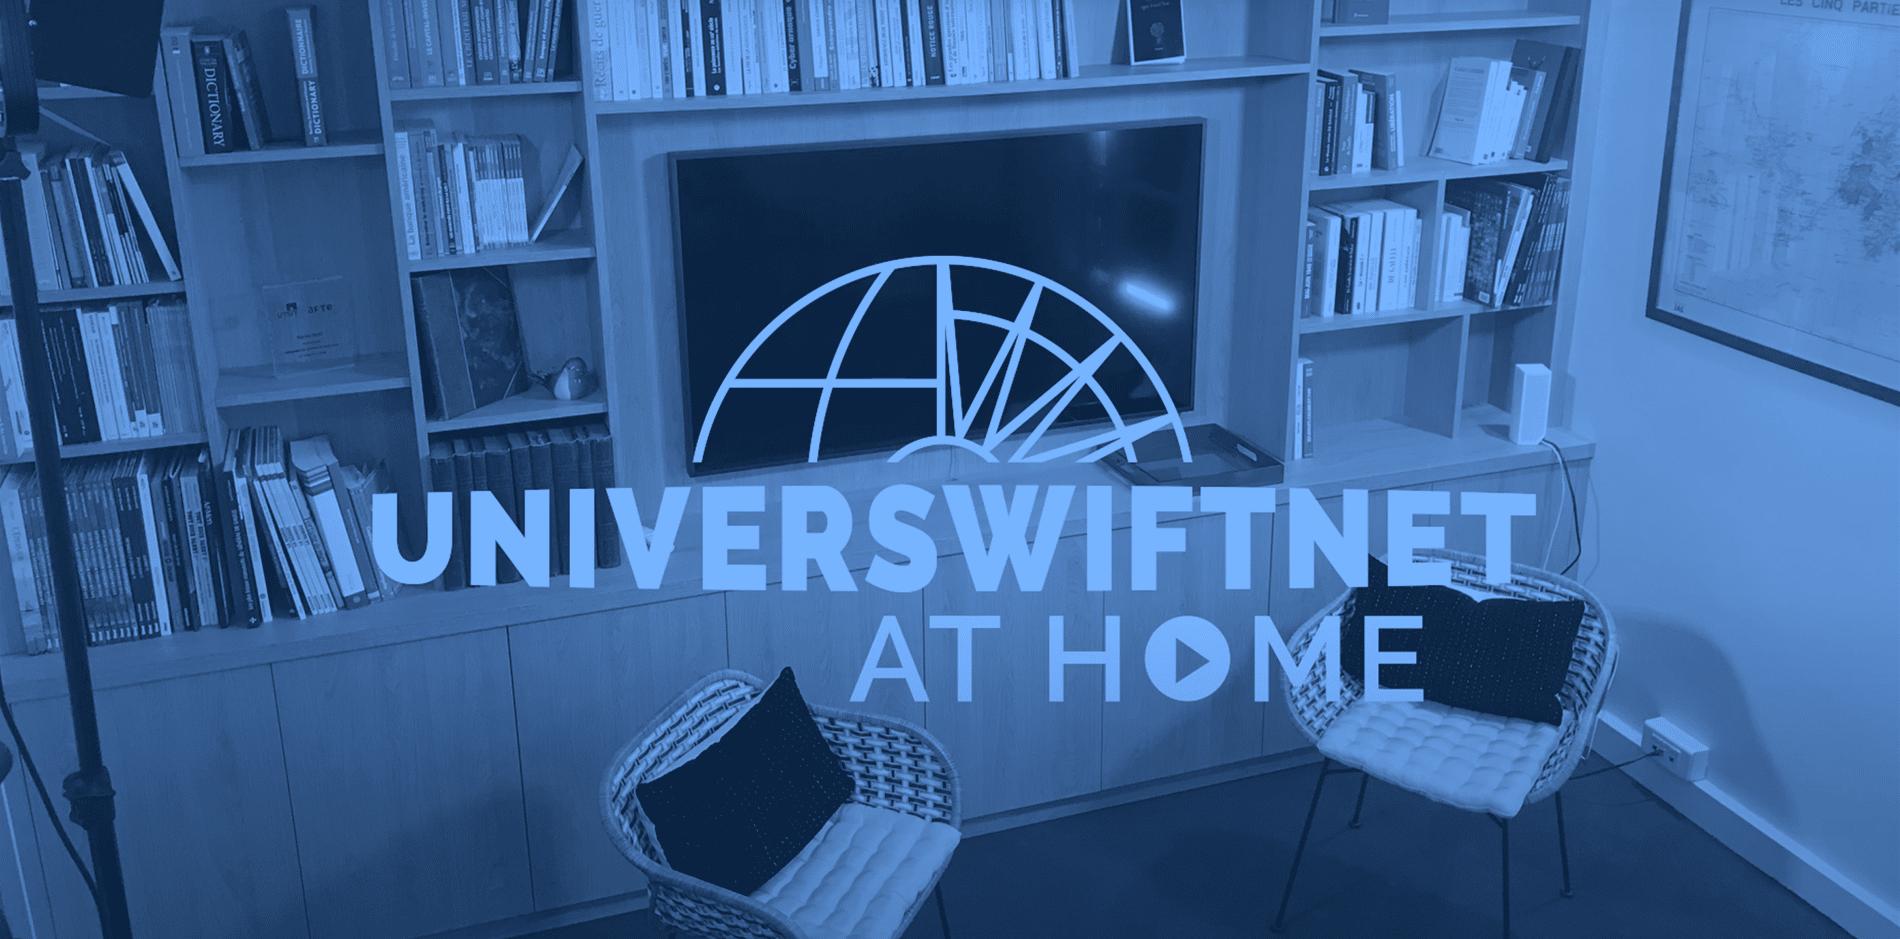 Blog universwiftnet@home